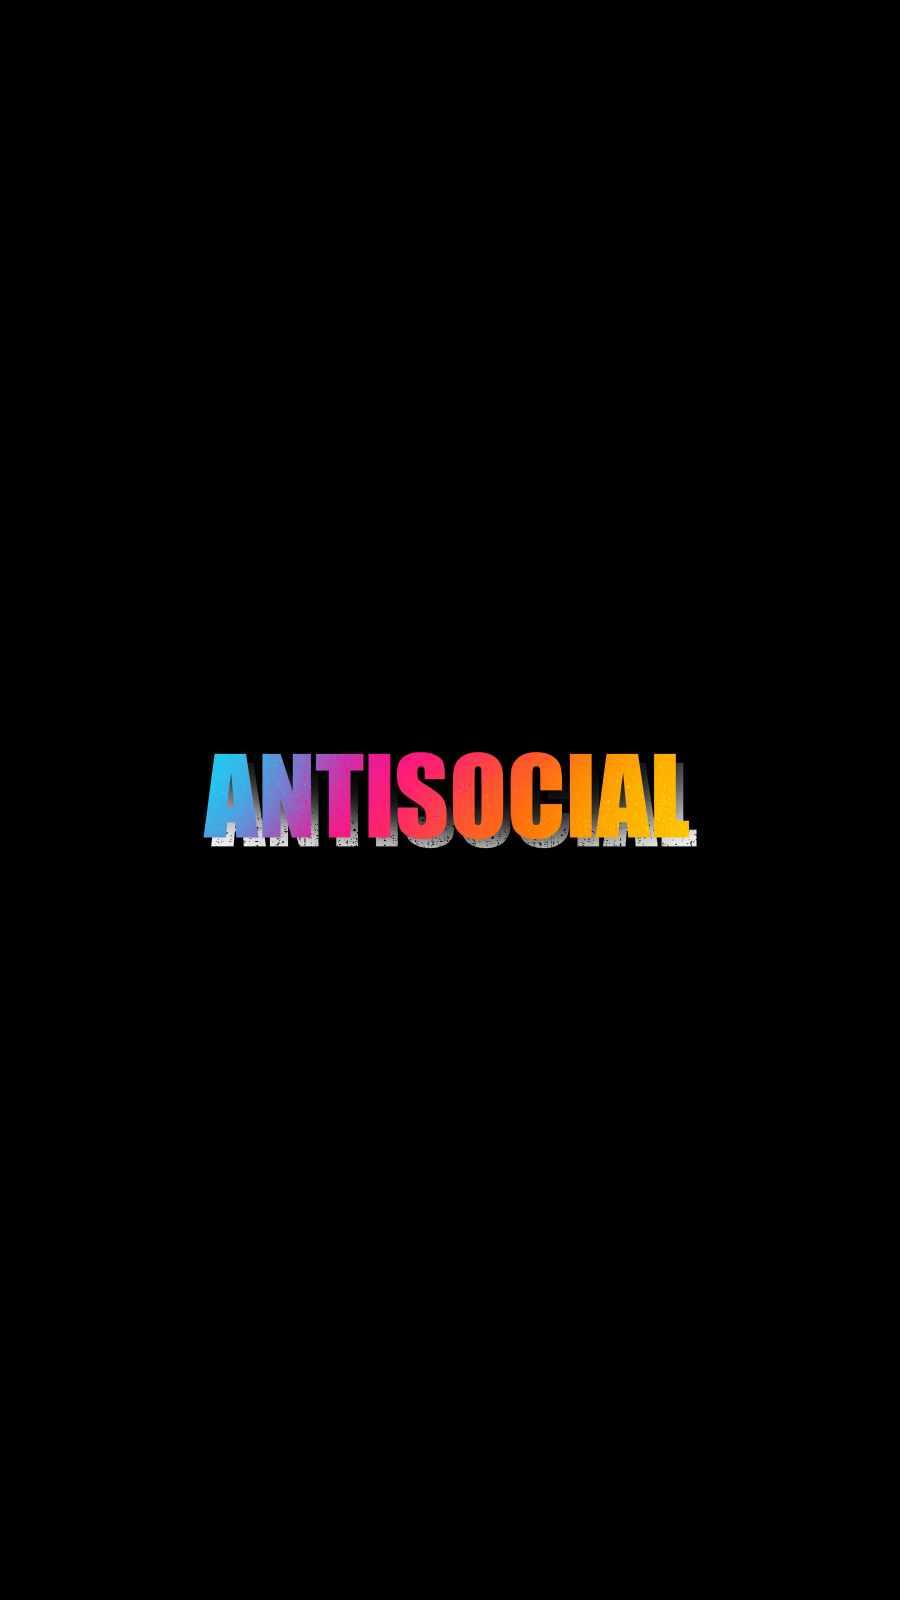 Antisocial iPhone Wallpaper